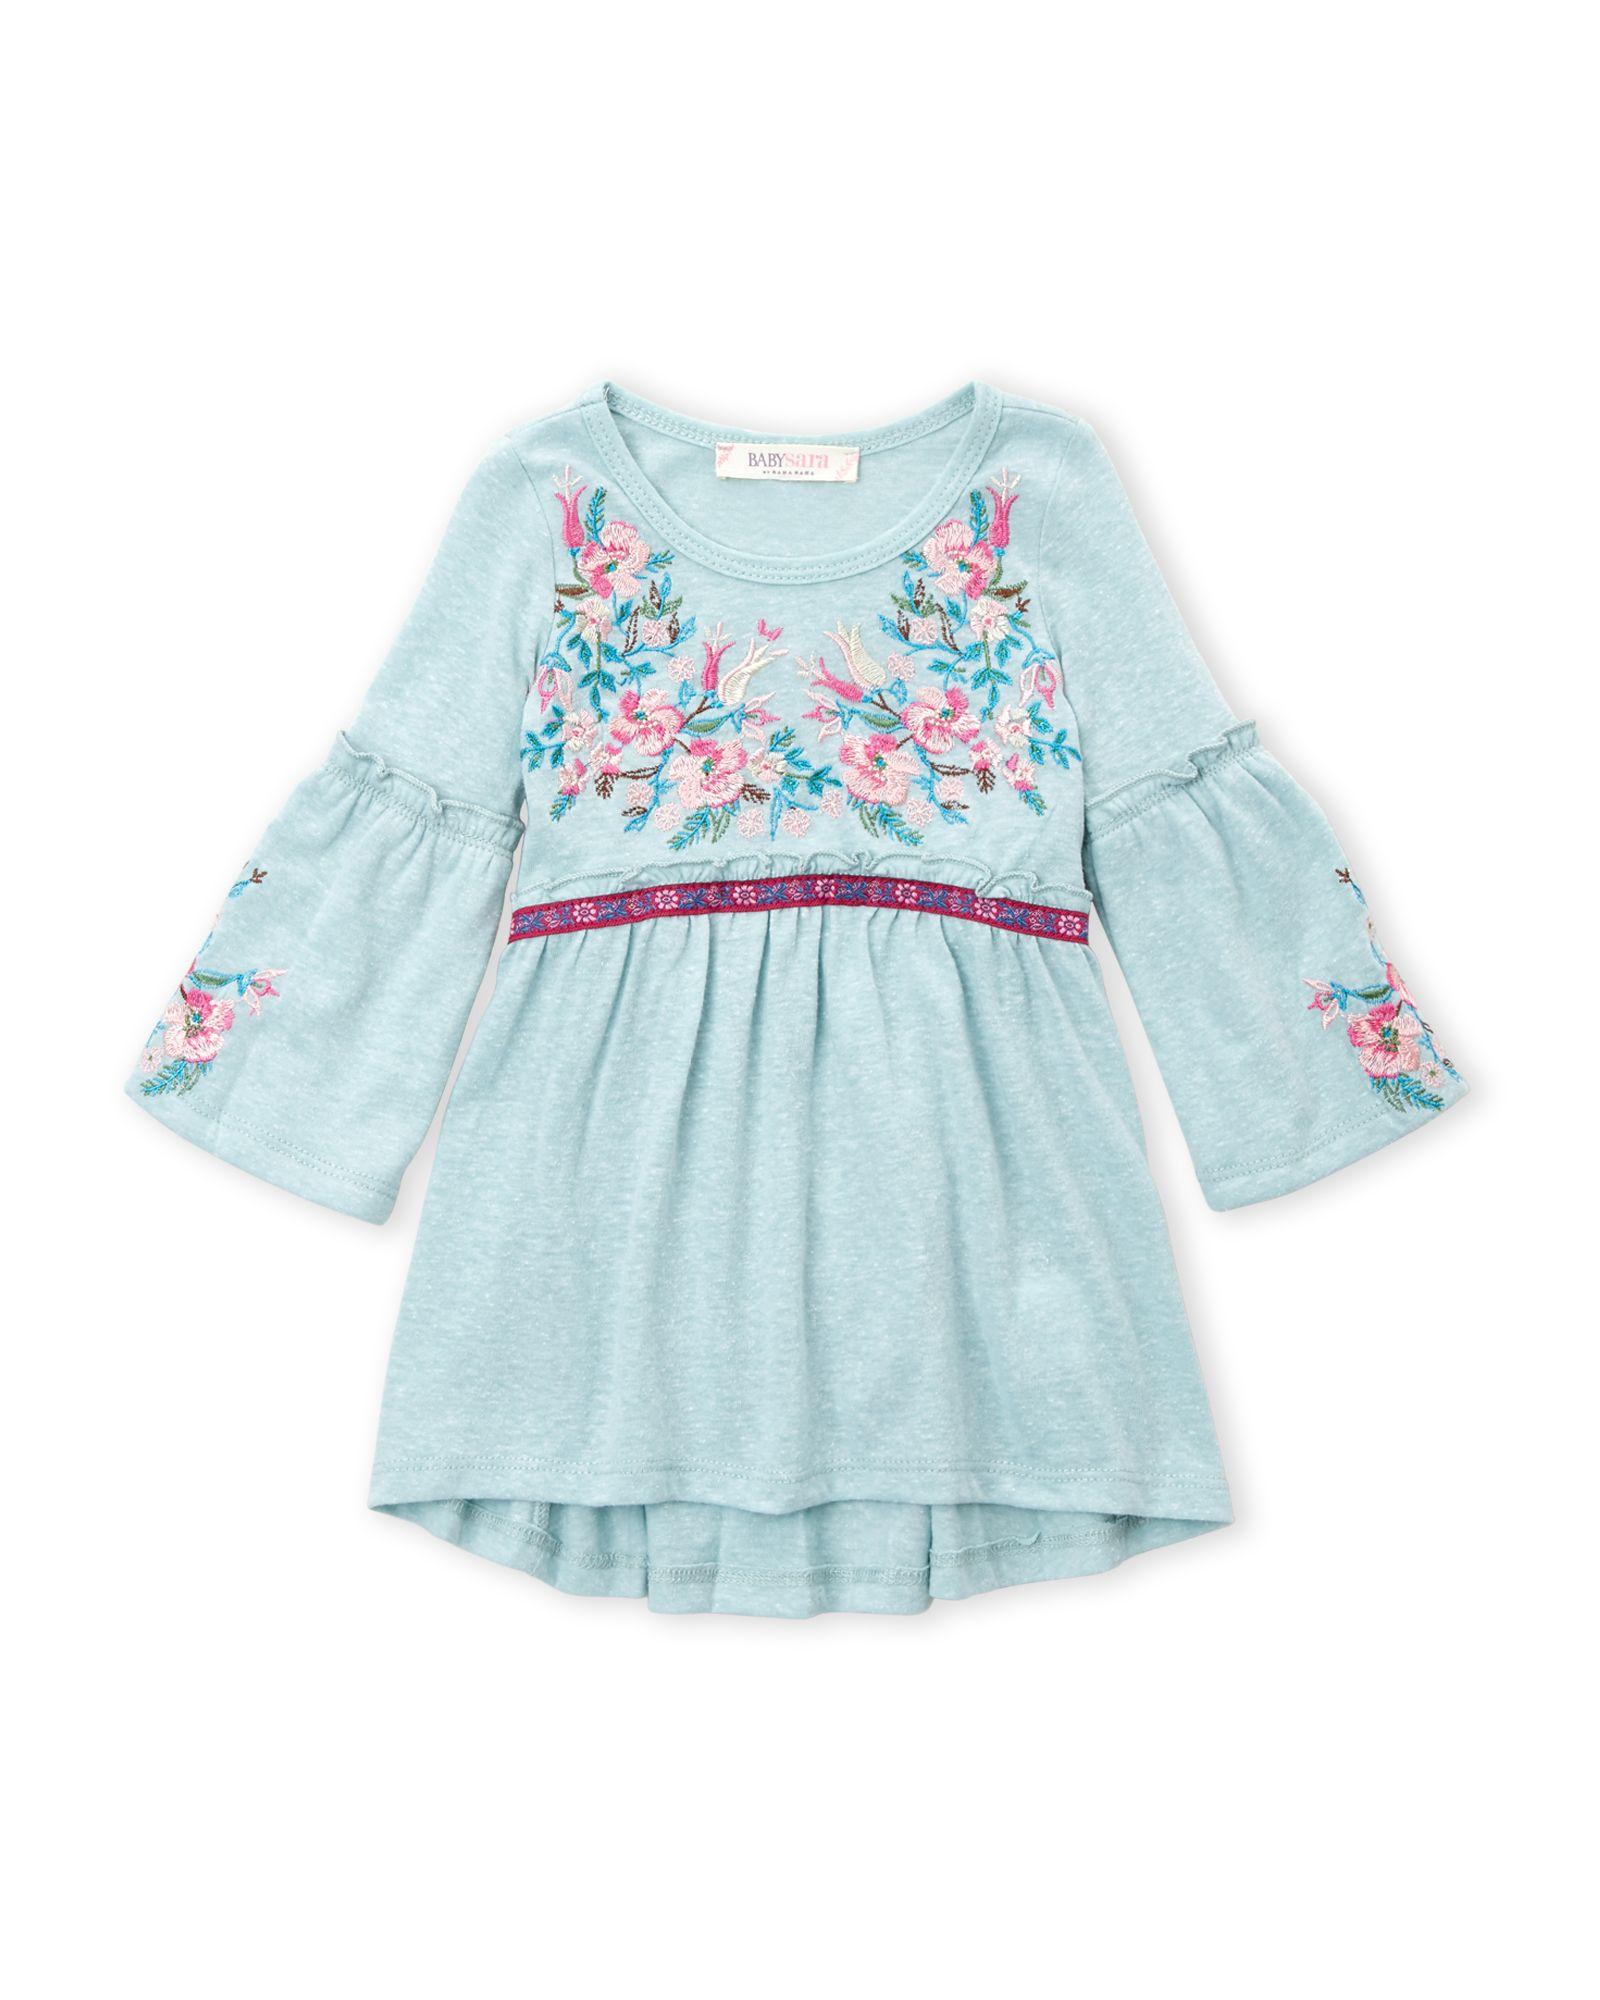 Baby Sara Infant Girls Floral Embroidered Dress